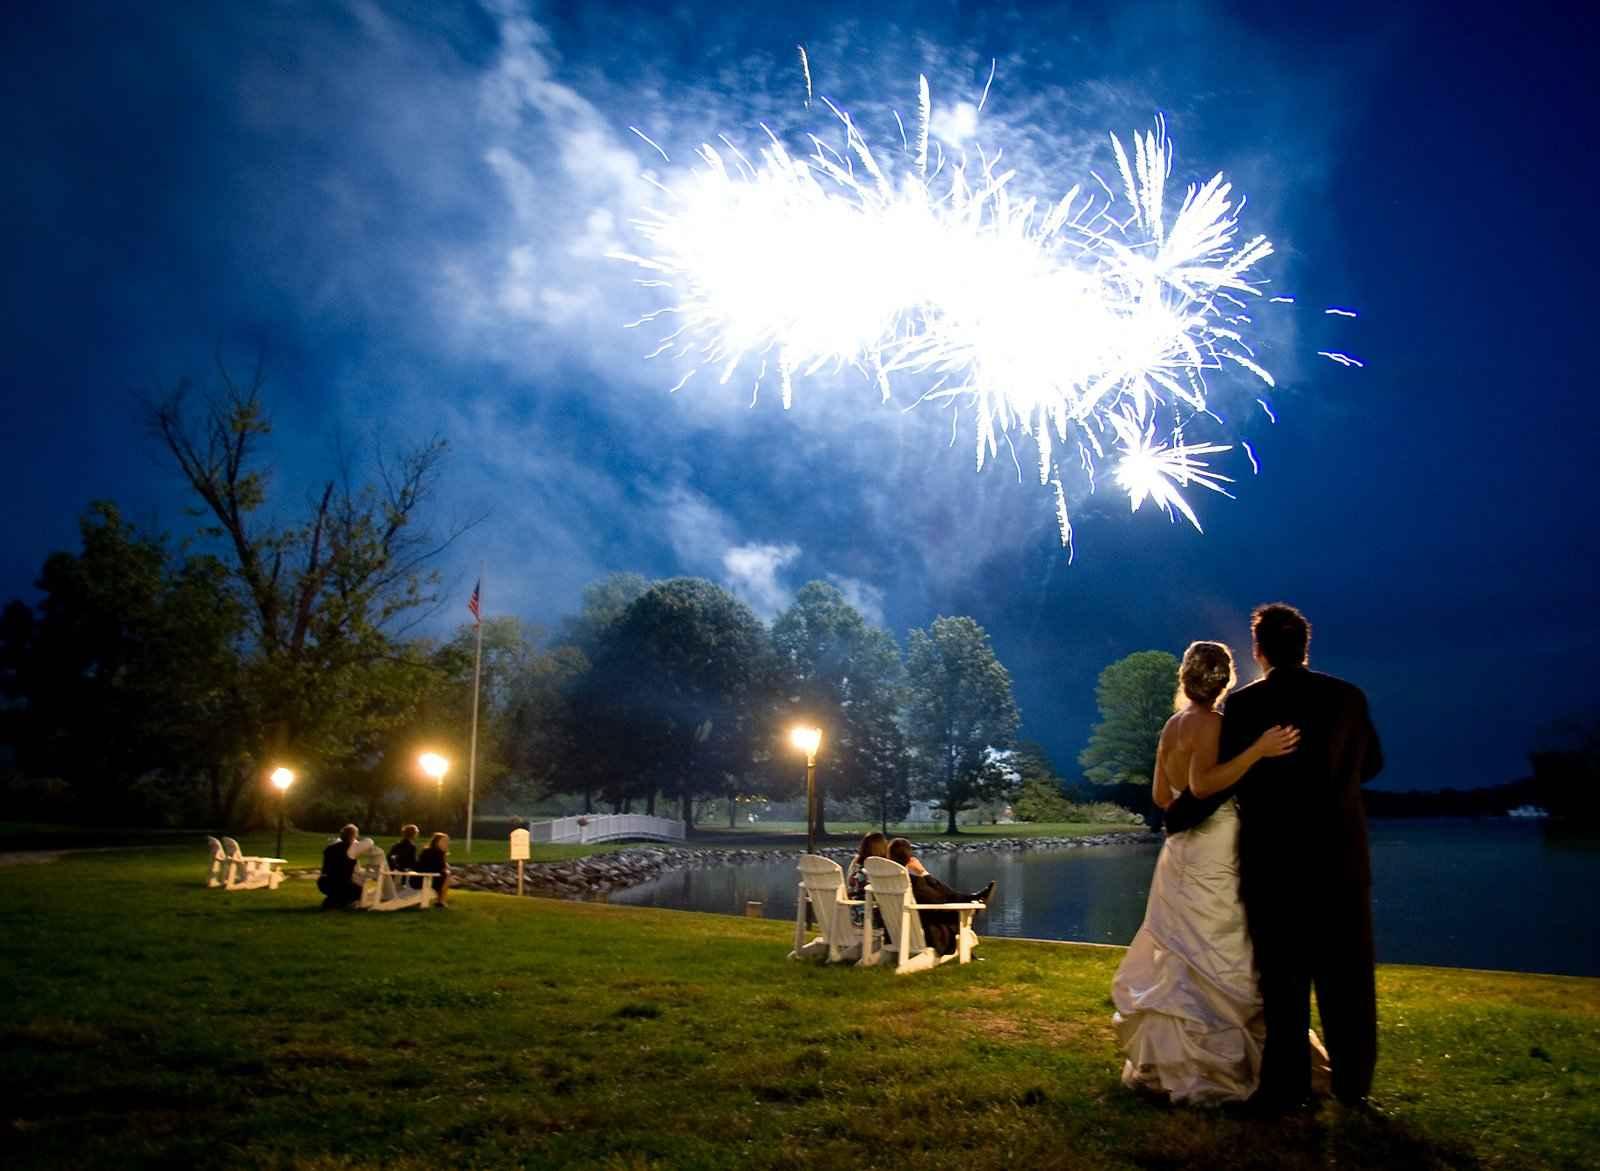 Pret Artificii Pret Artificii Nunta Oferta Artificii